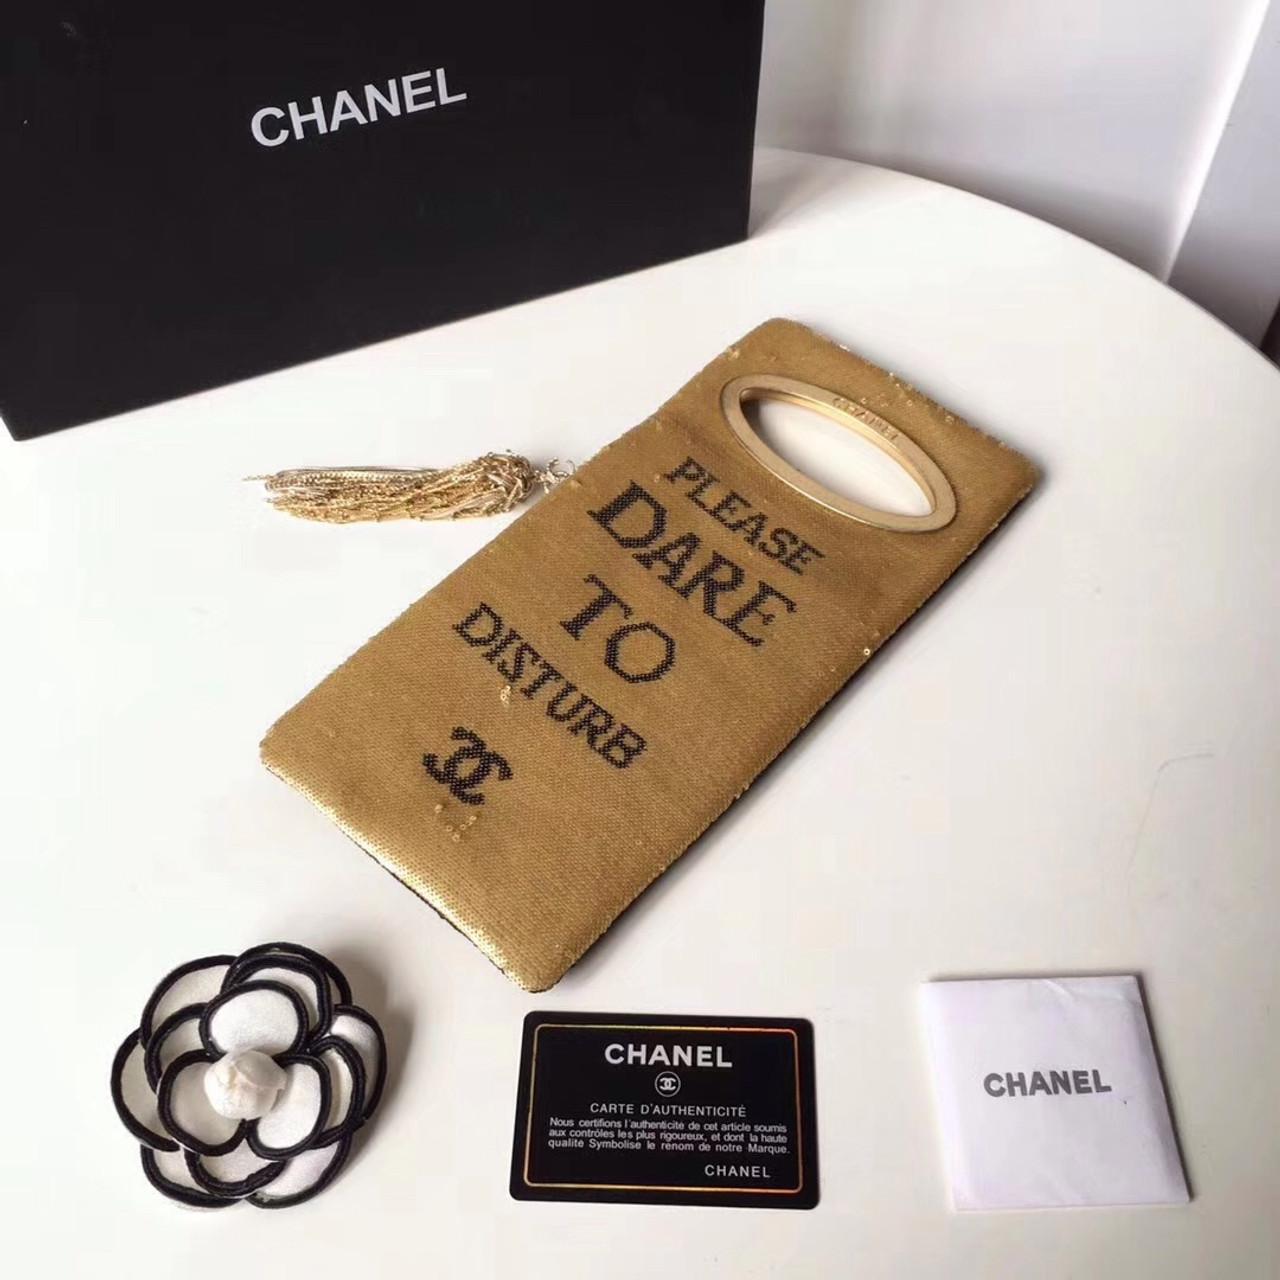 15a655c5bd79 Chanel Please Do Not Disturb Clutch Bag Black  Gold - Bella Vita Moda